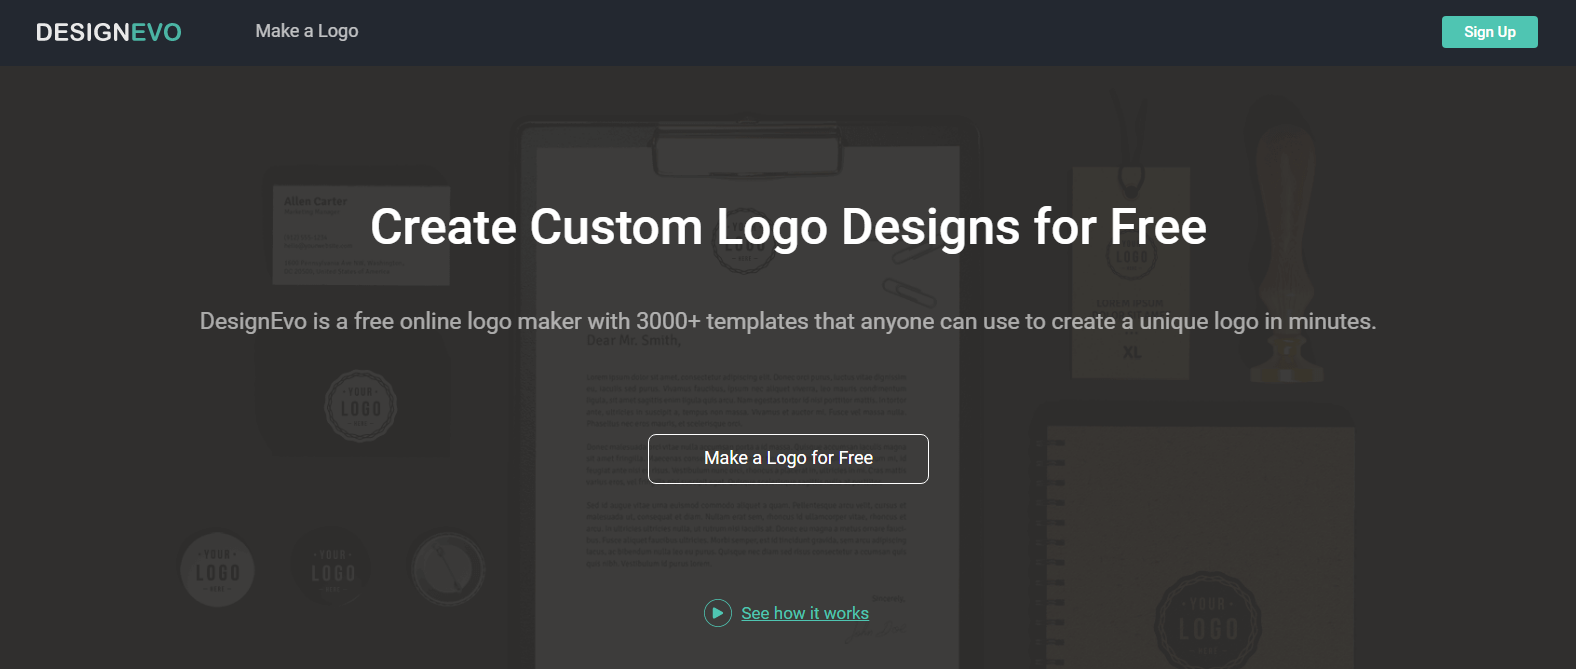 Designevo Review A Free And User Friendly Online Logo Maker